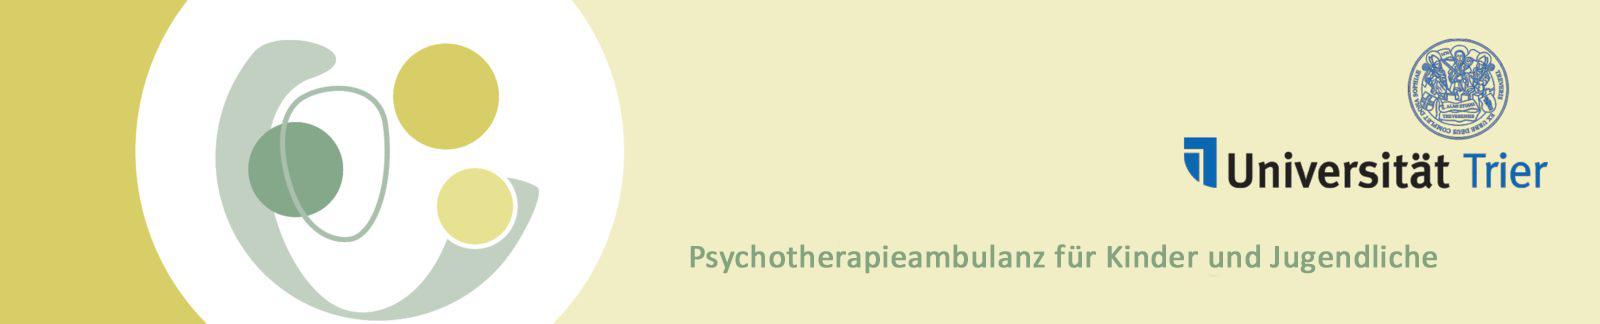 Psychologie Unis